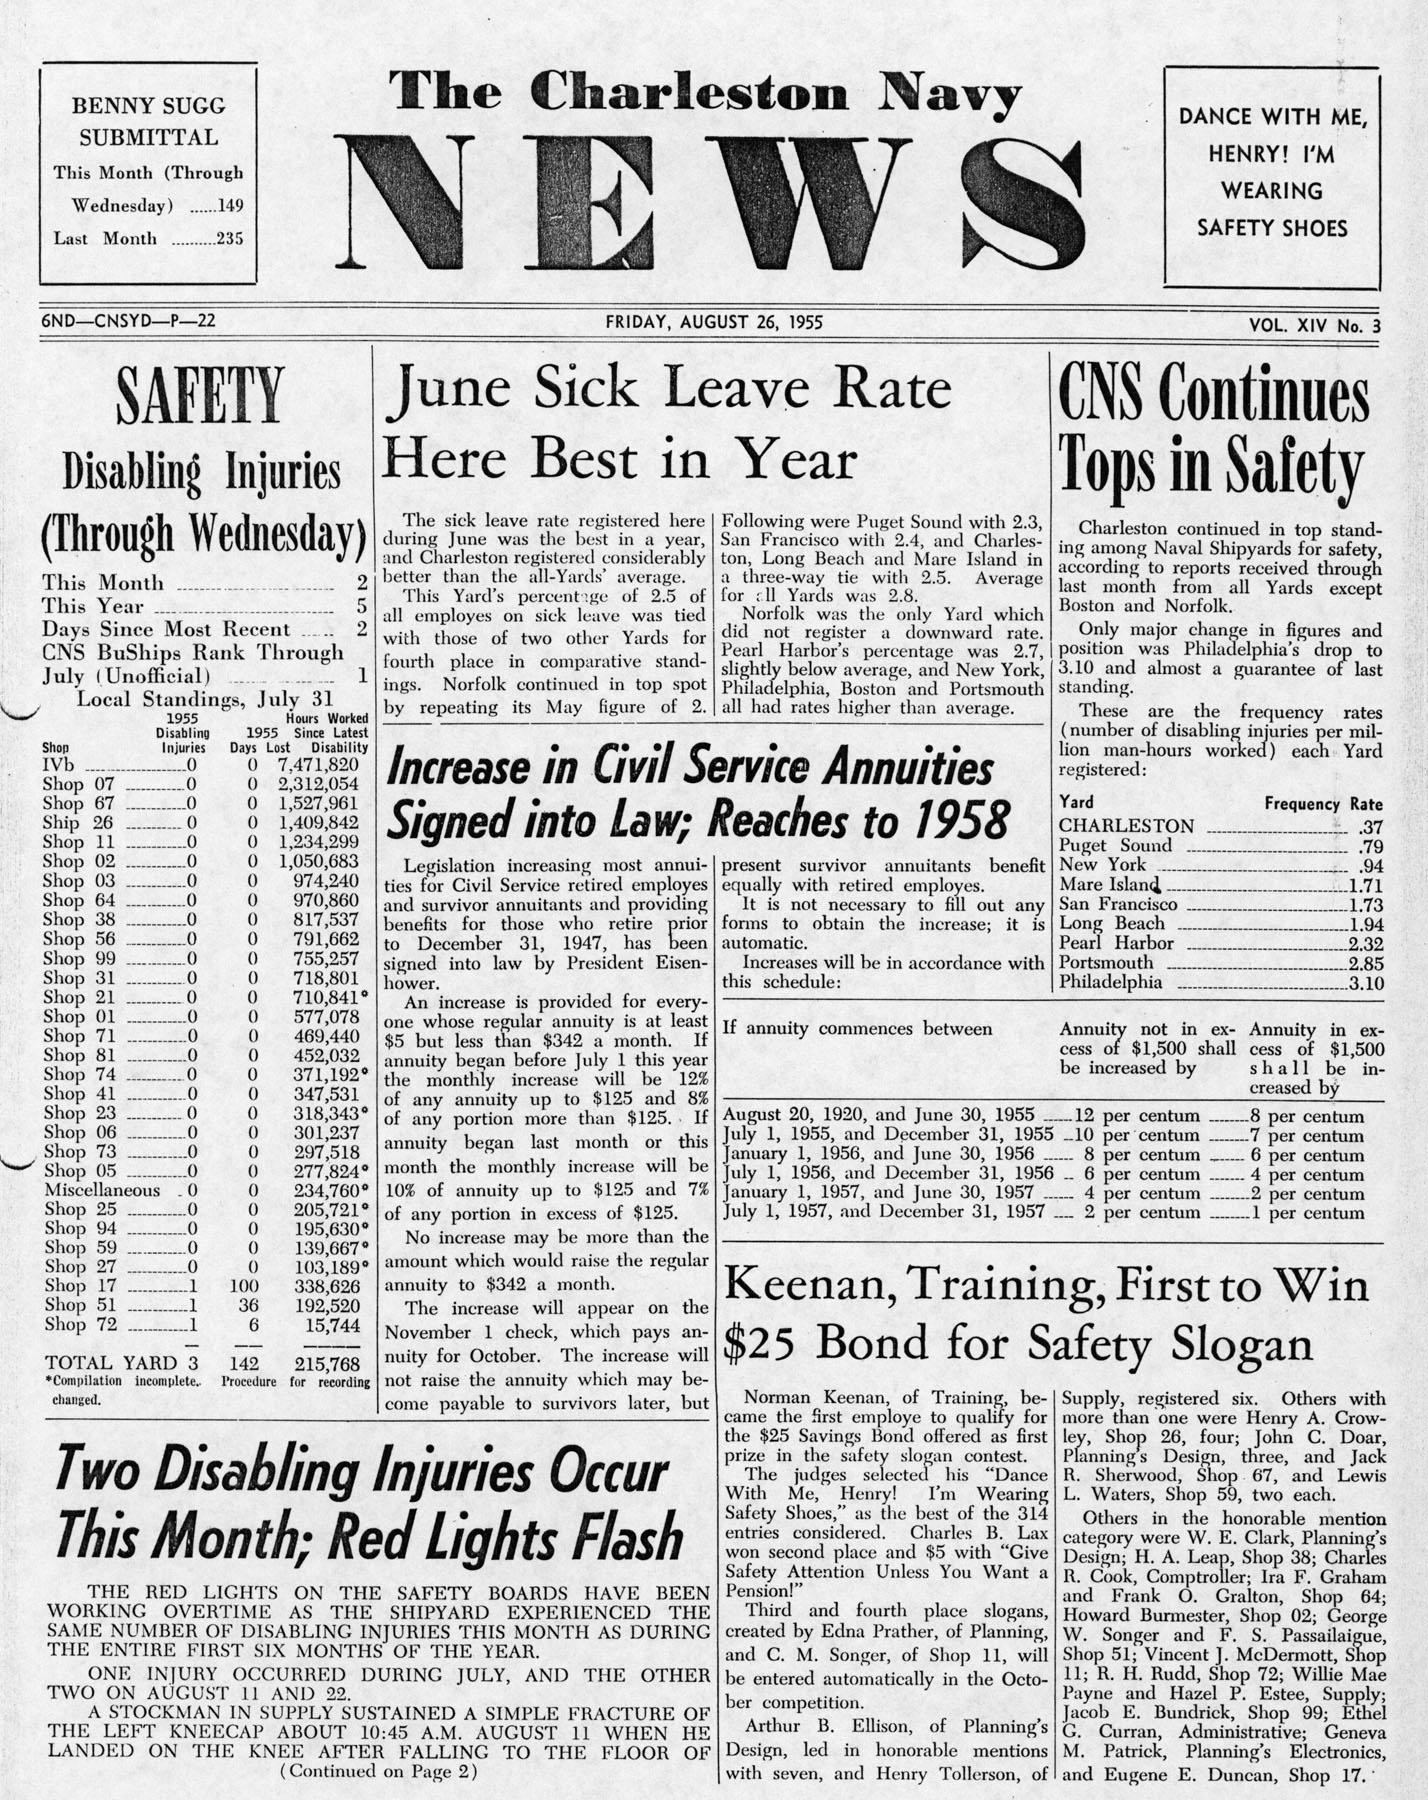 The Charleston Navy News, Volume 14, Edition 3, page i